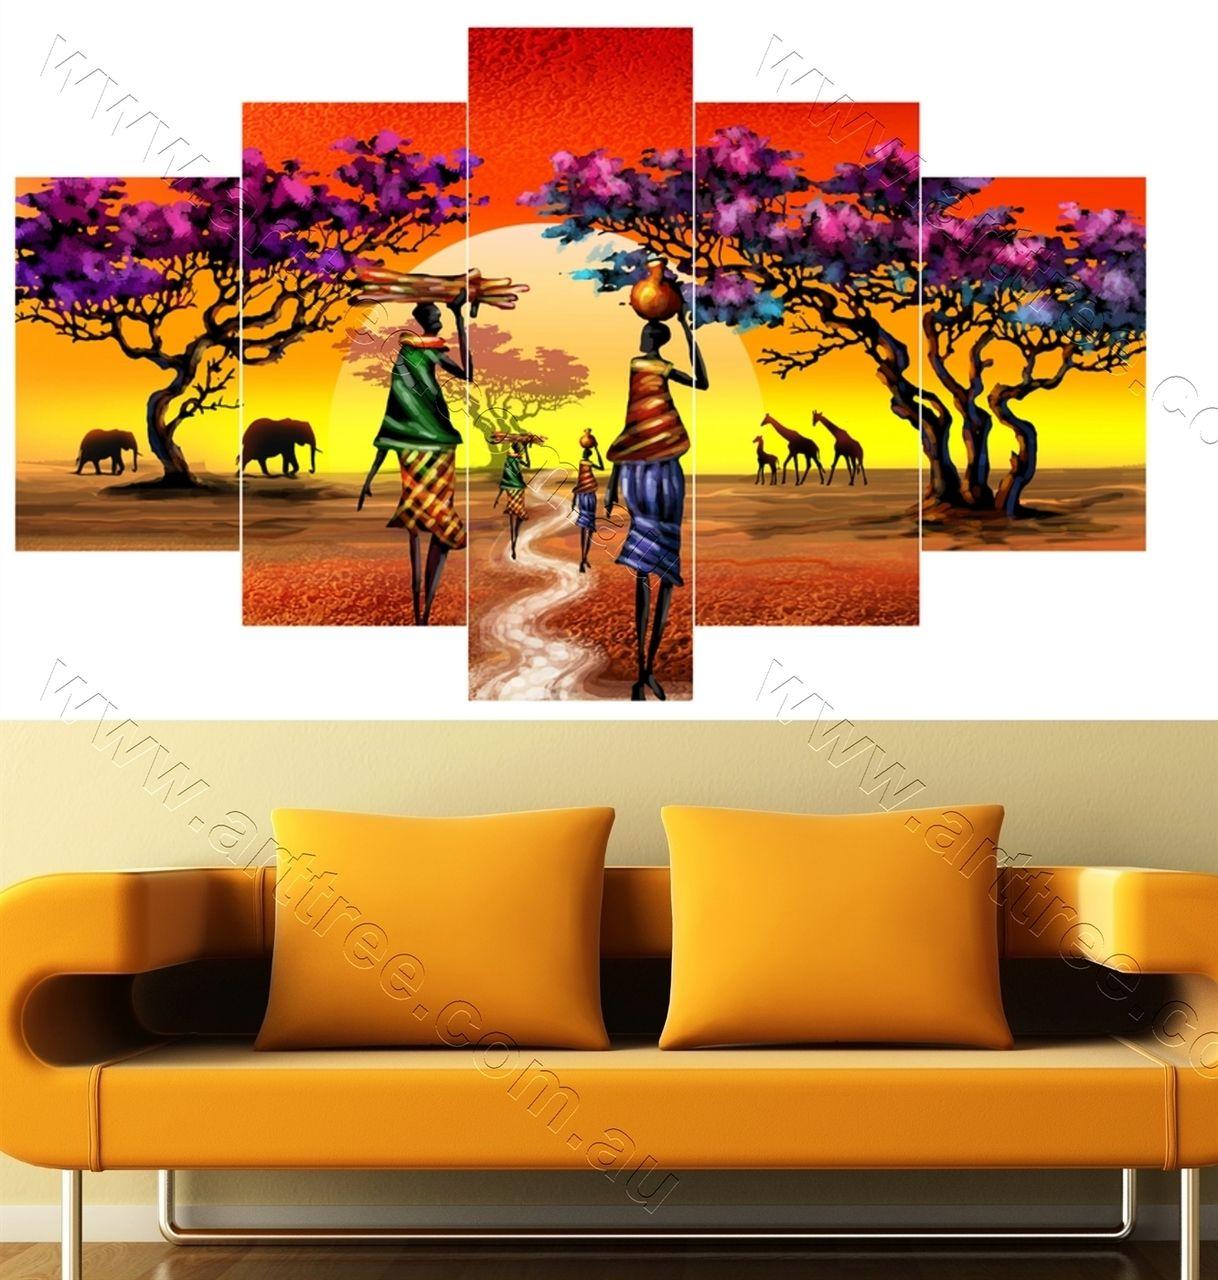 Tribal African Jungle Safari | Pinterest | African jungle, Tribal ...